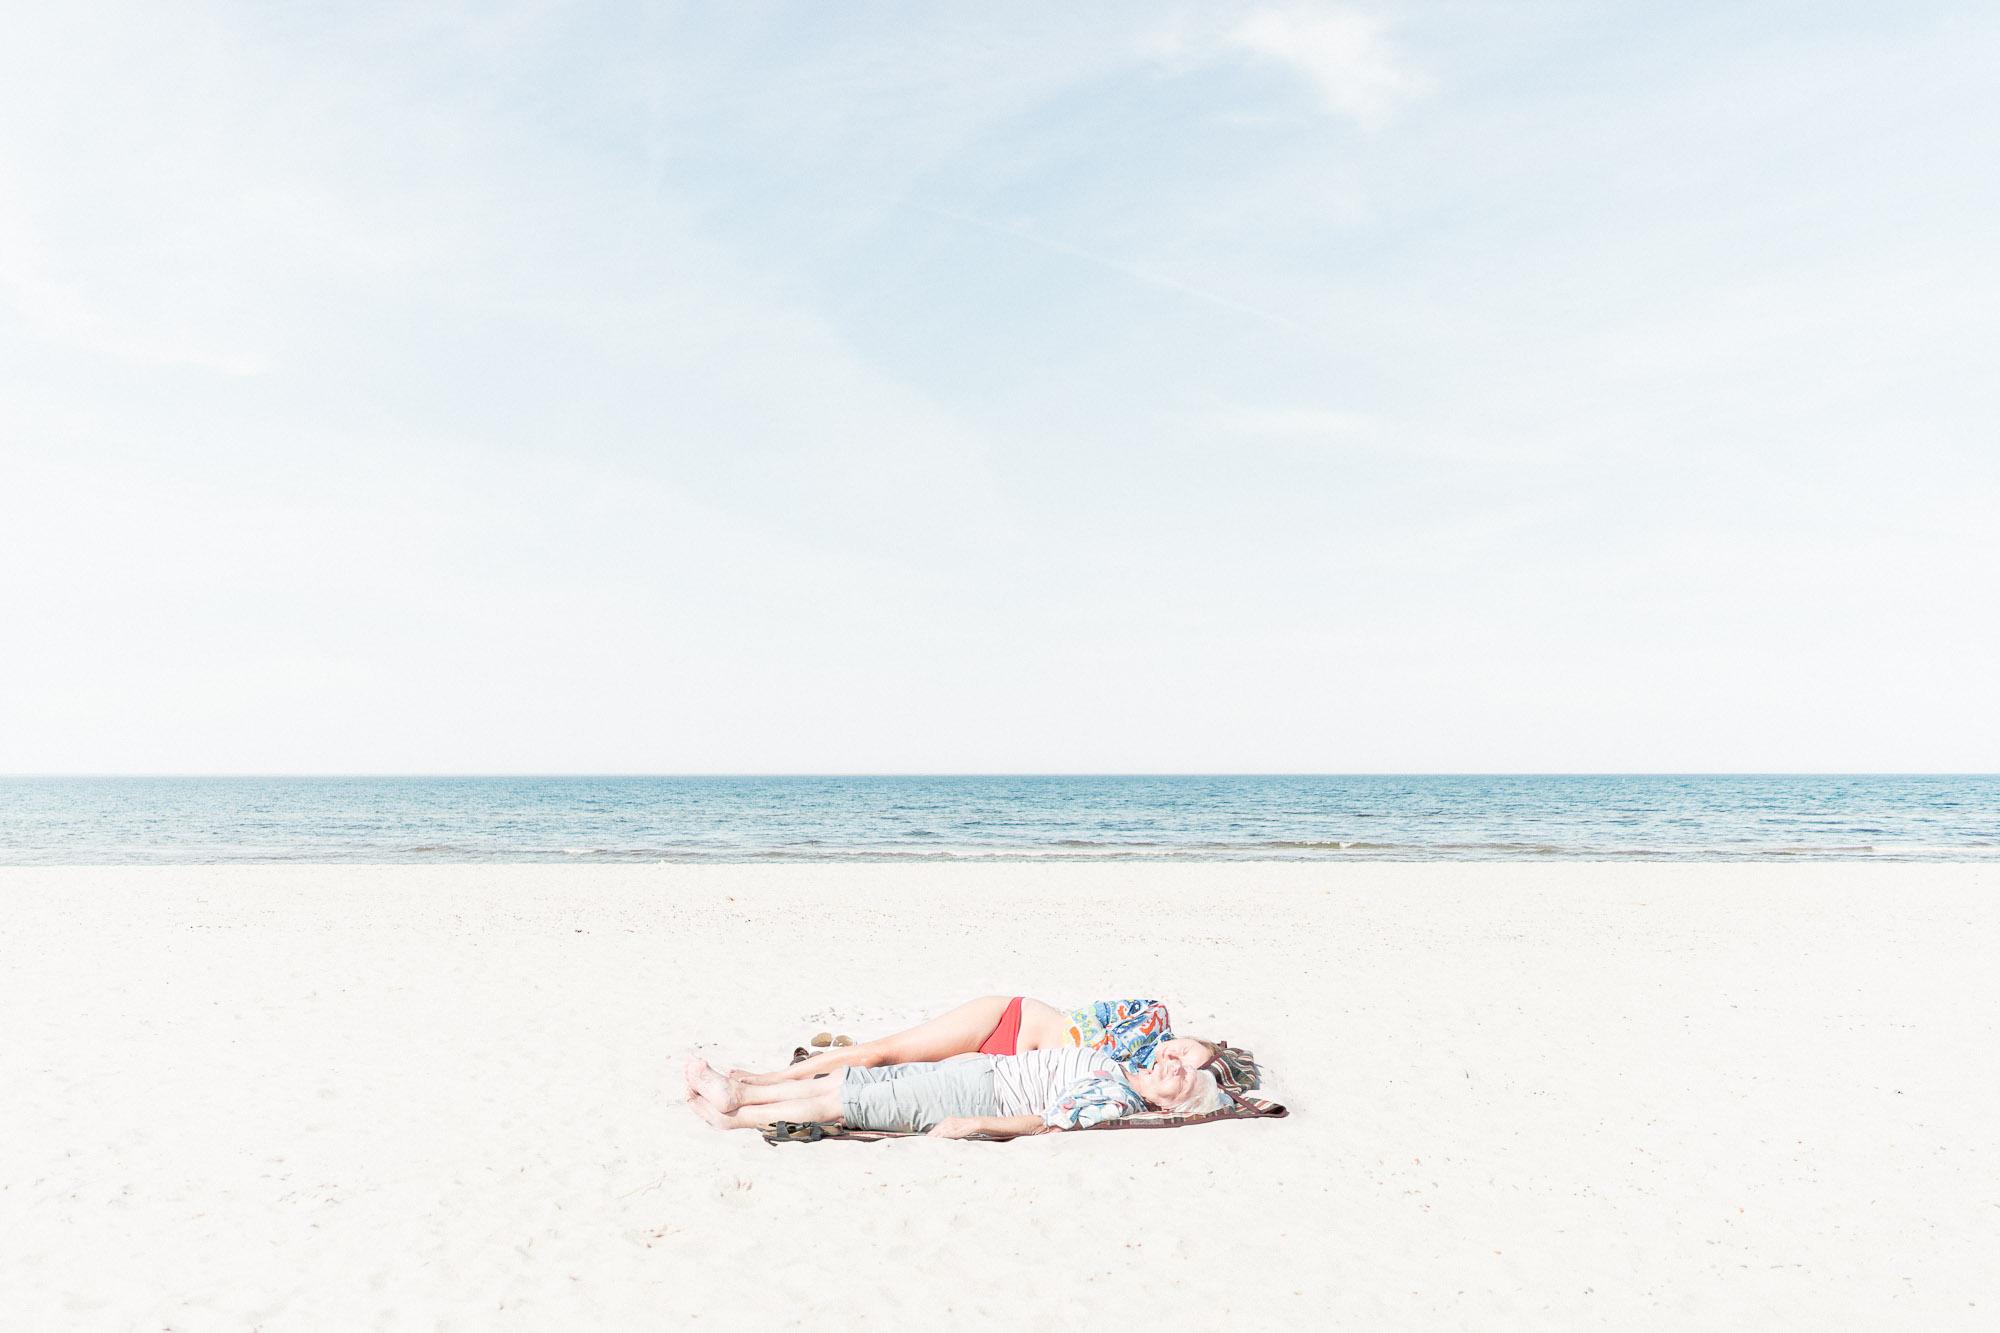 02-Ladies-Dunes-Slowinski-Baltic-Sea-Leba-Copyright-Luca-Bacciocchi